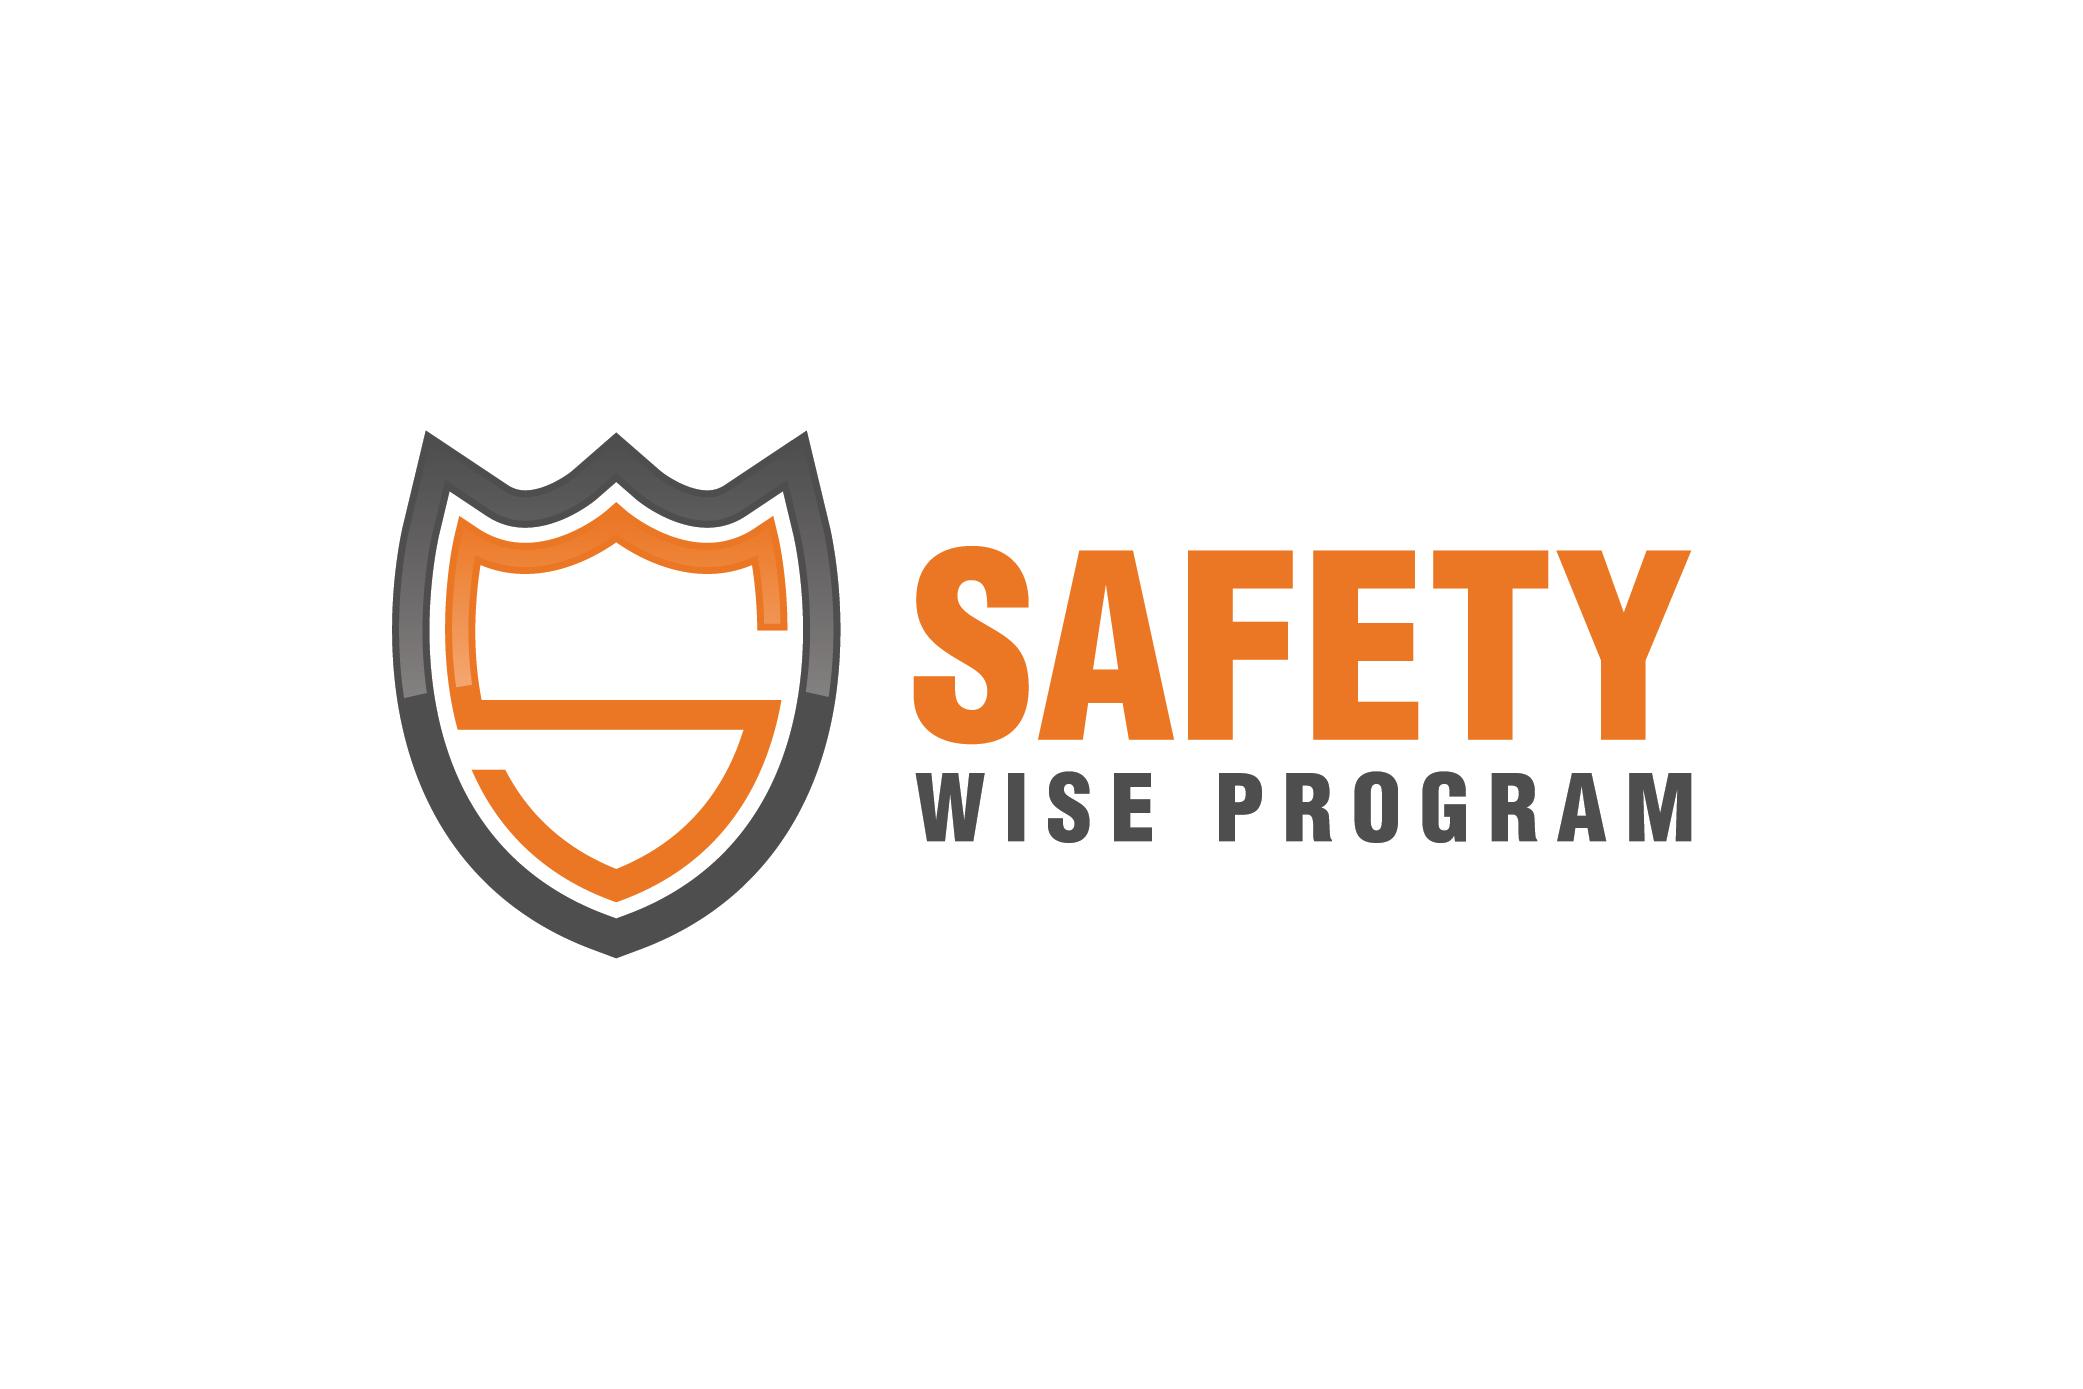 Logo Design by Raheel Baloch - Entry No. 63 in the Logo Design Contest New Logo Design for Safety Wise Program.